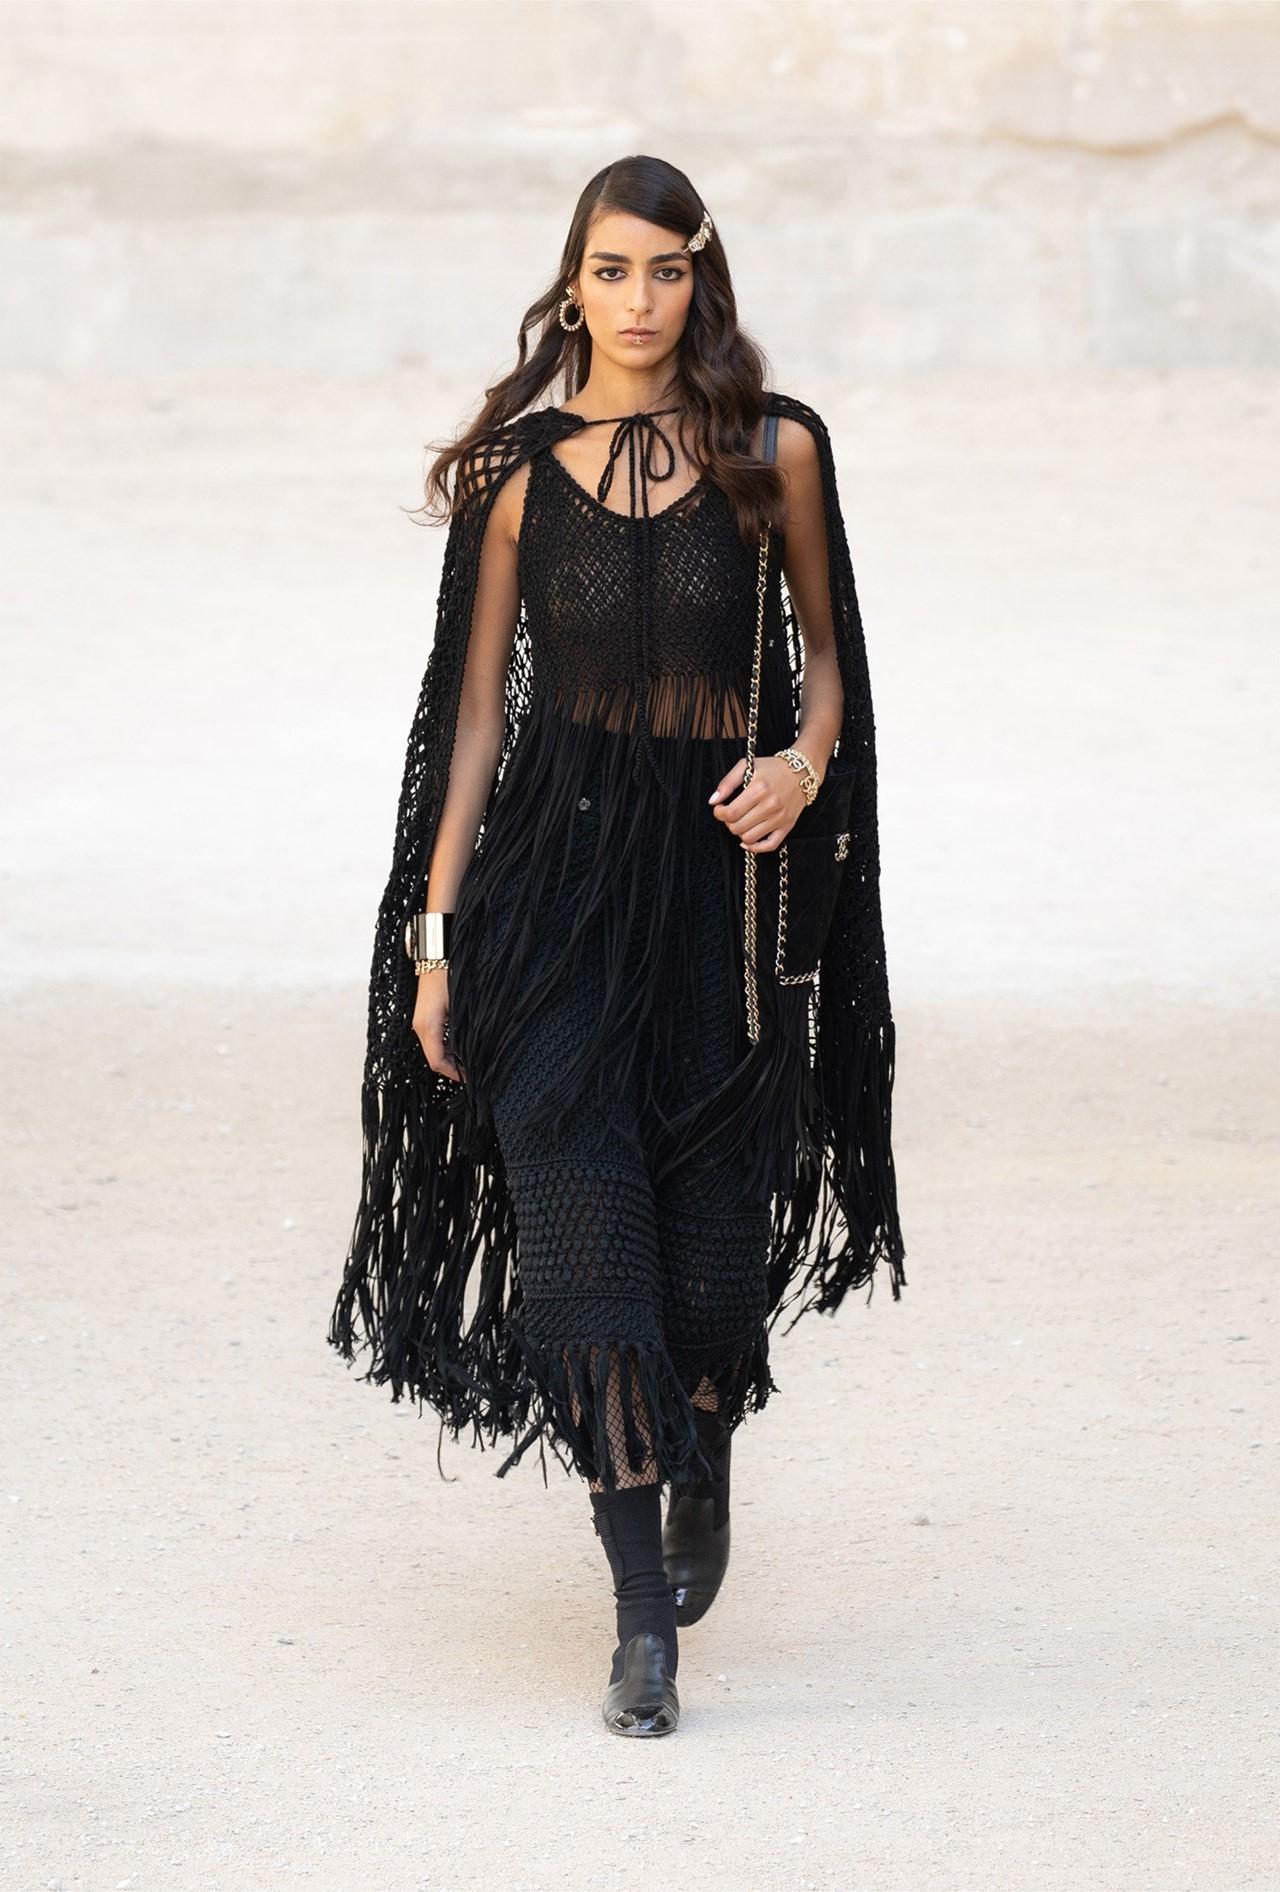 Chanel_Cruise_2022_Fashionela (28)